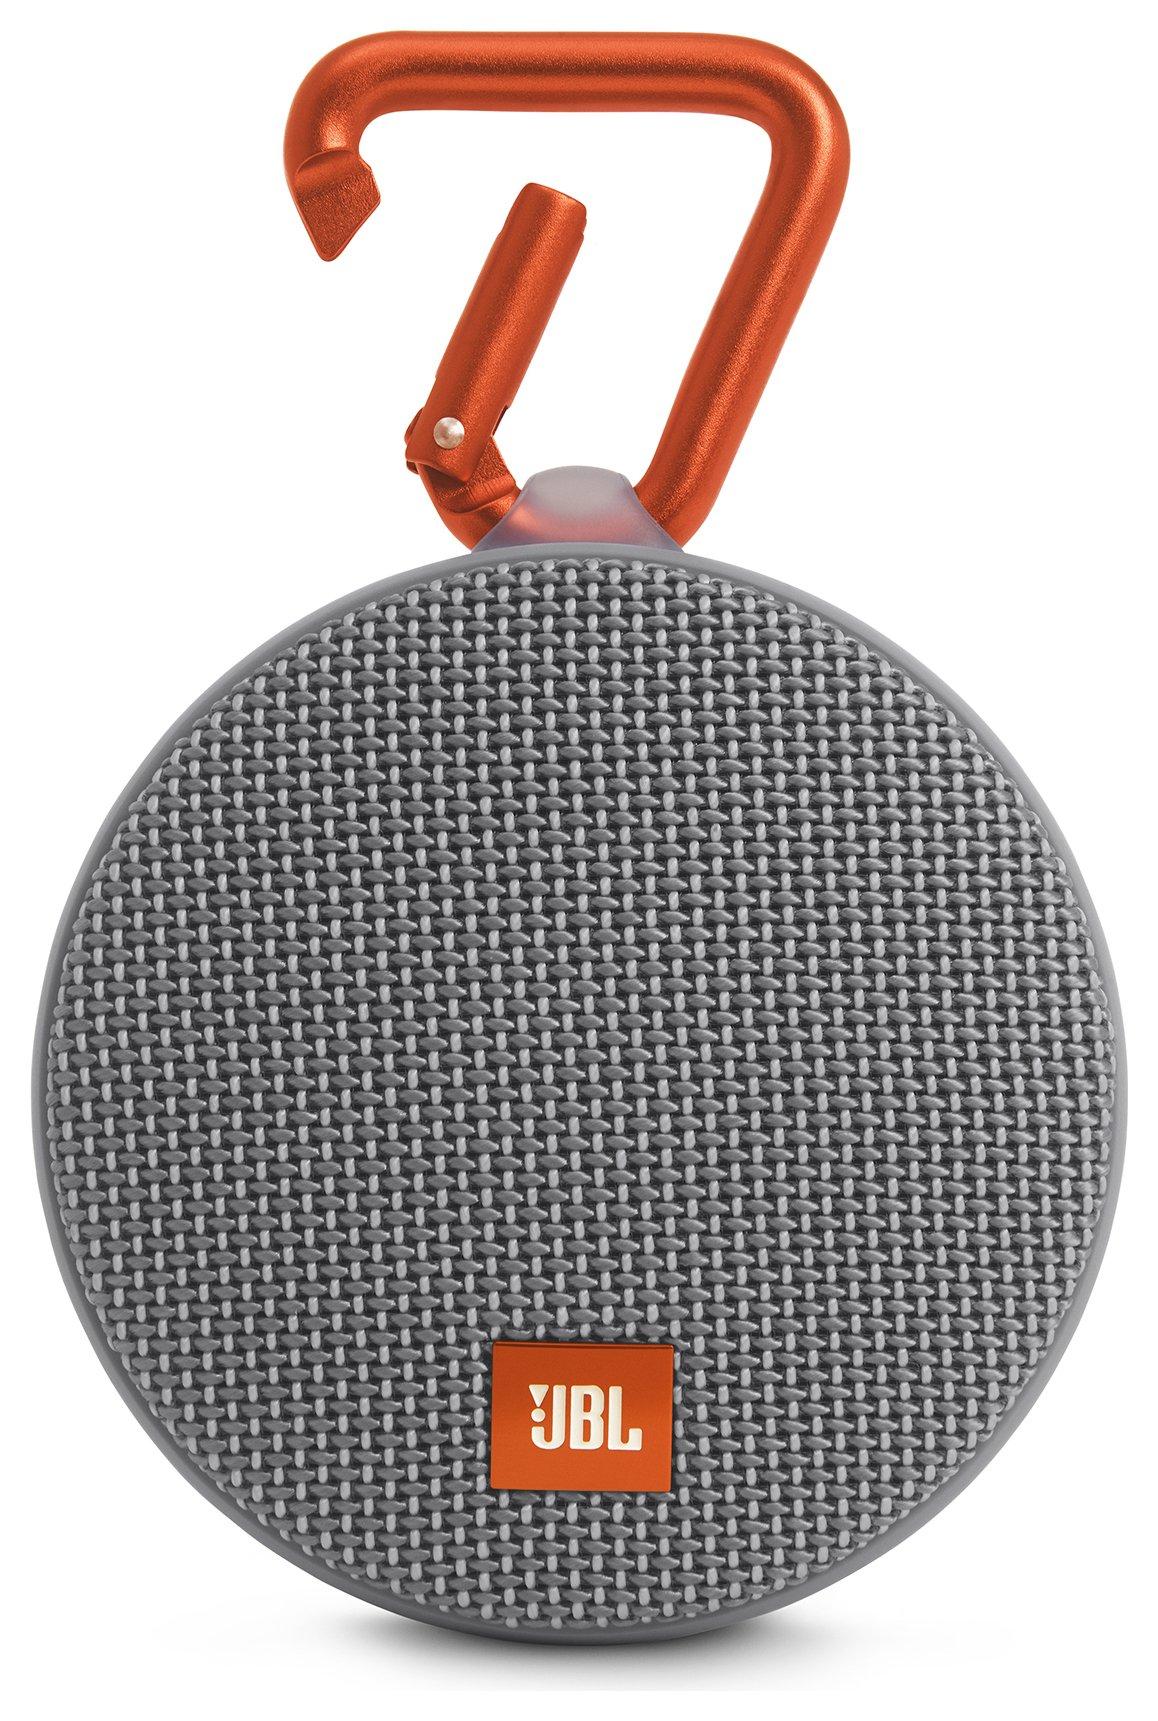 JBL Clip 2 Waterproof Portable Speaker - Grey